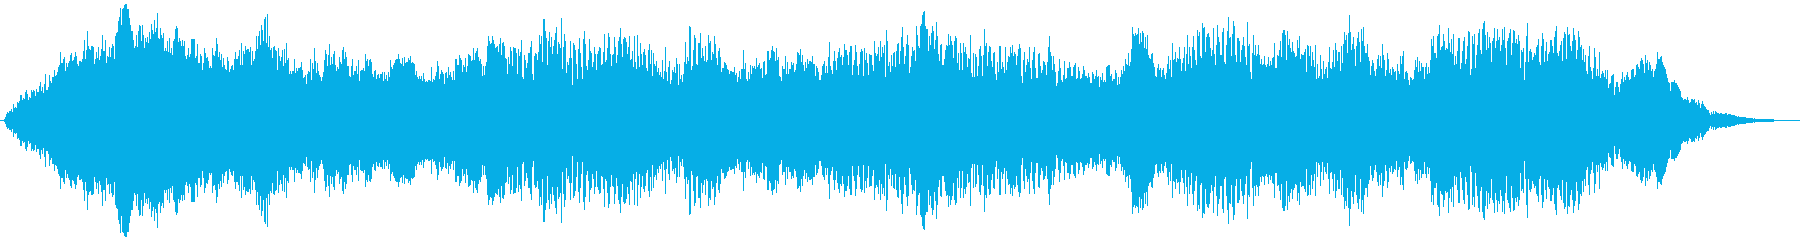 PADS 死へ01の再生済みの波形